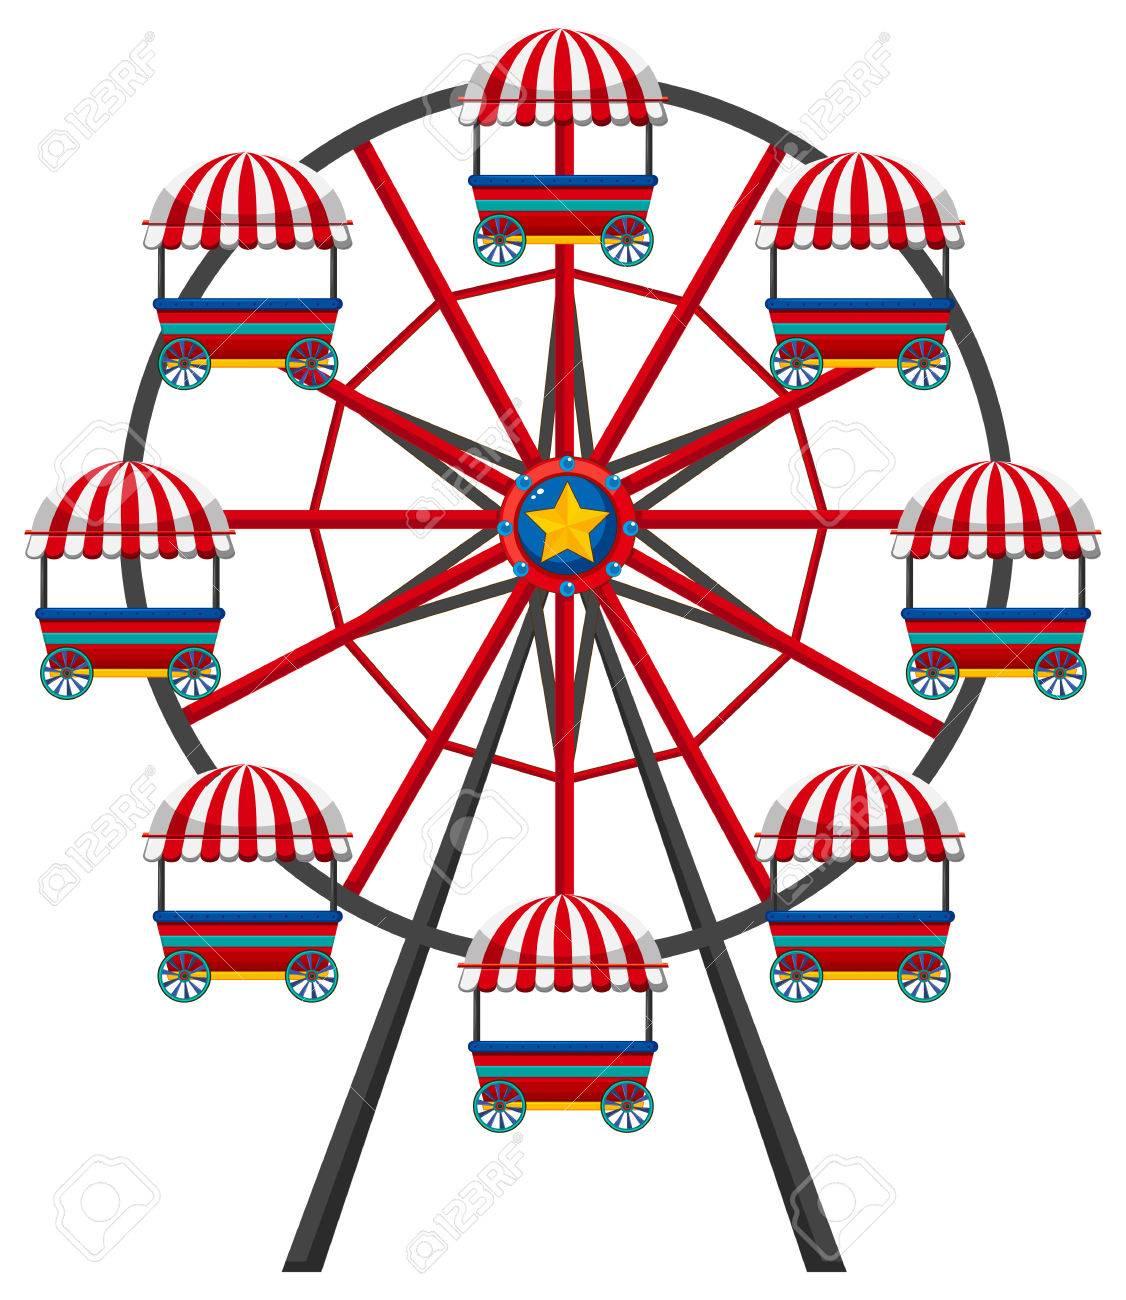 Ferris wheel on white background illustration.